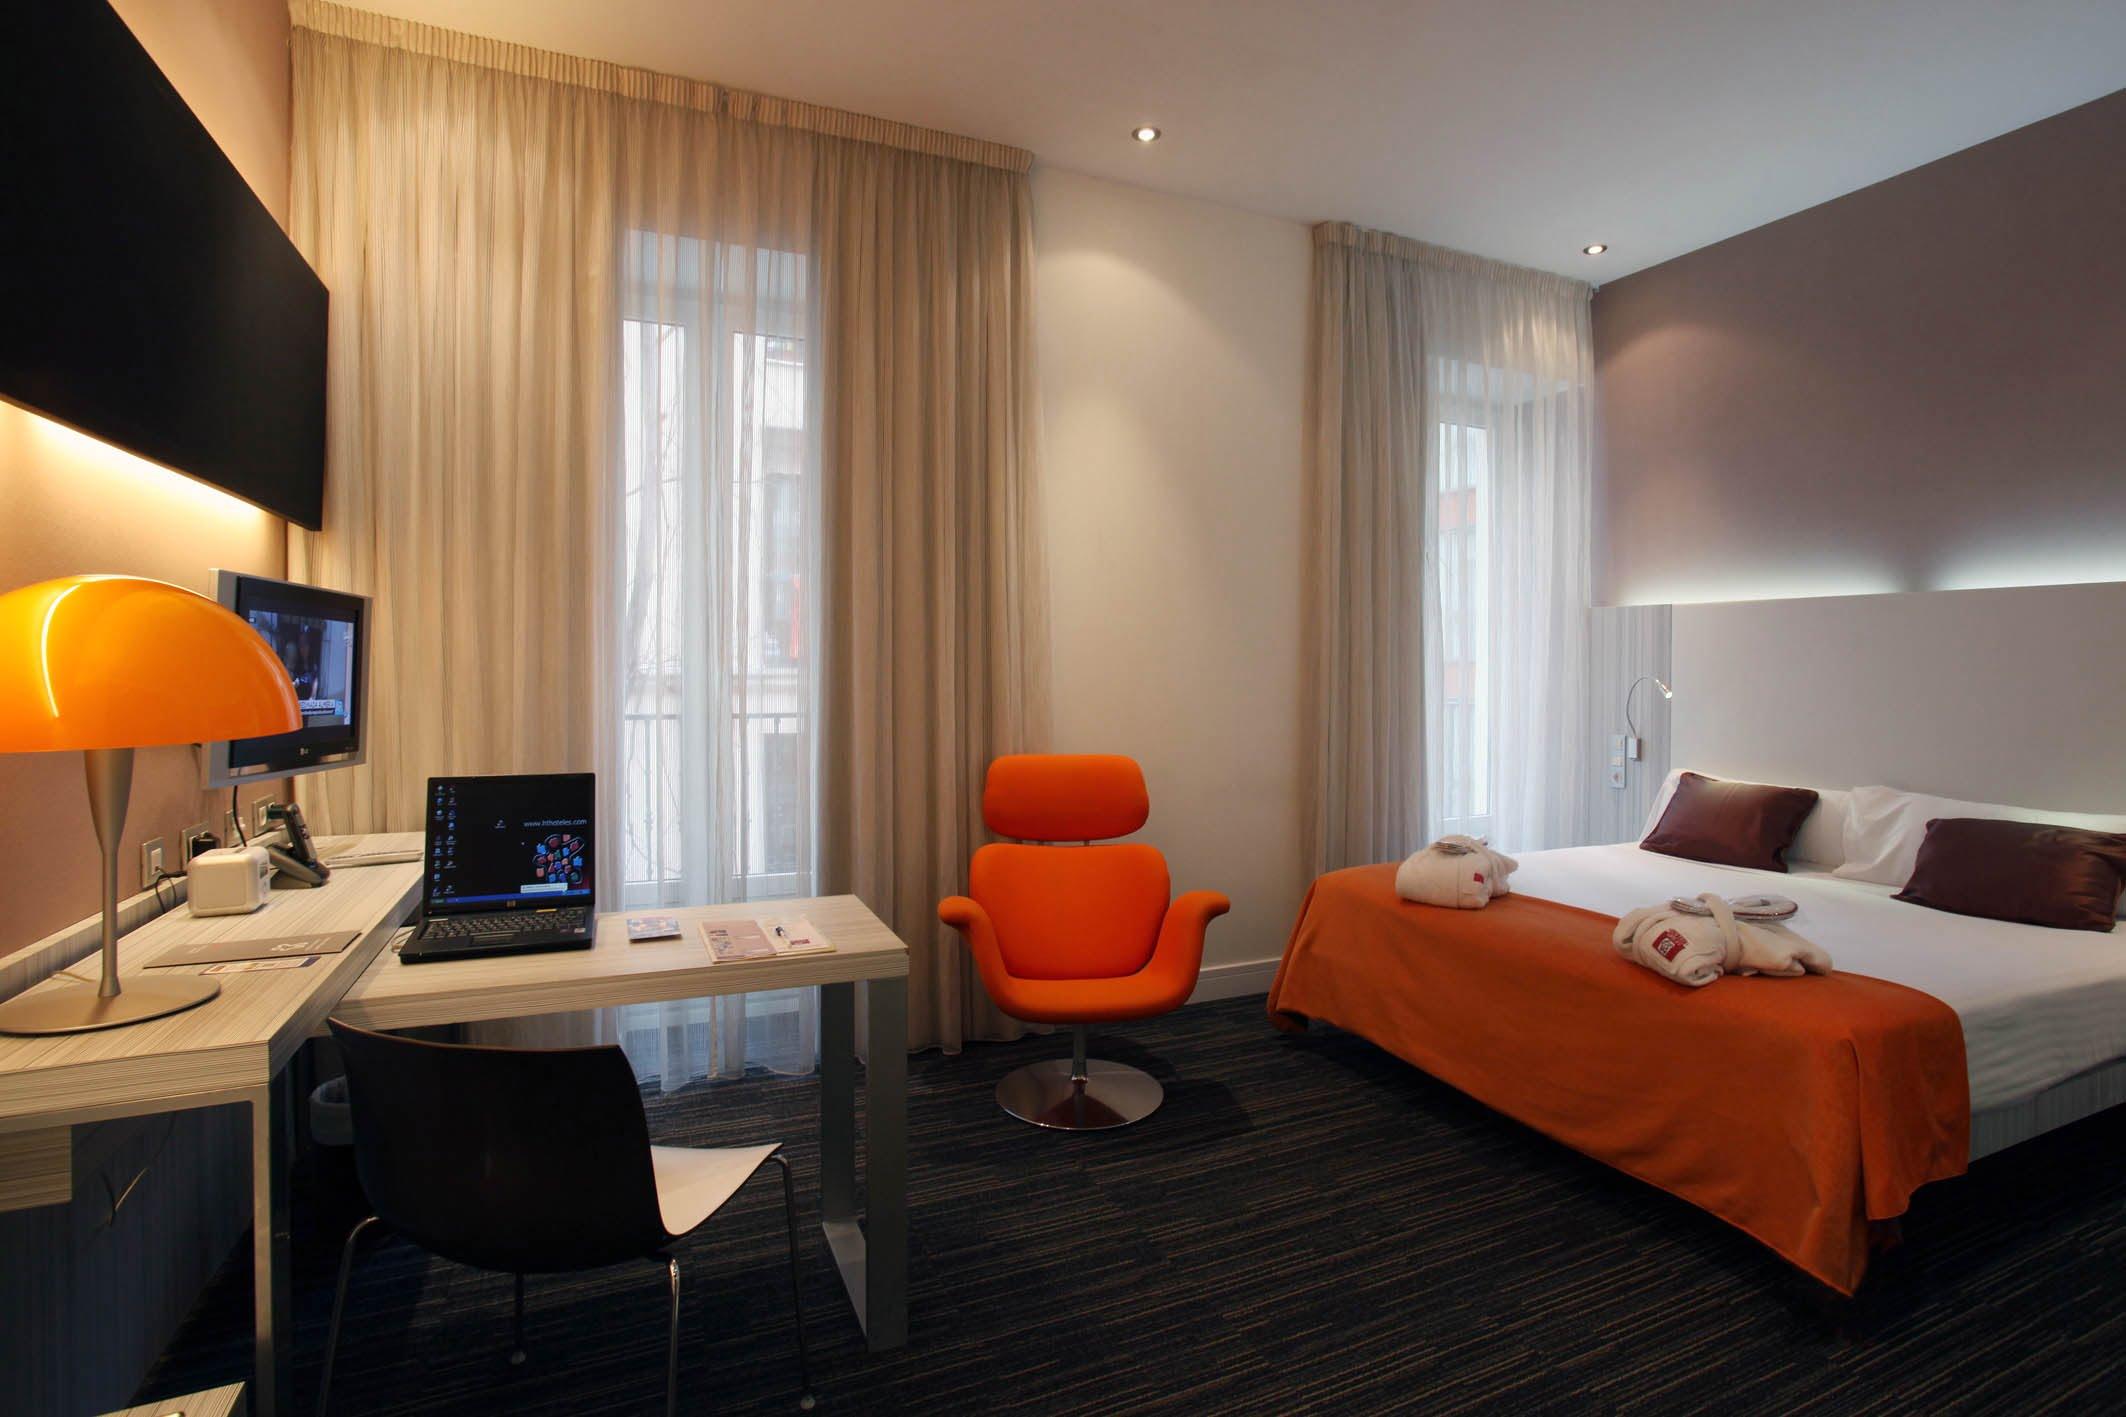 Hotel petit palace embassy en madrid hoteles con encanto for Hoteles encanto madrid